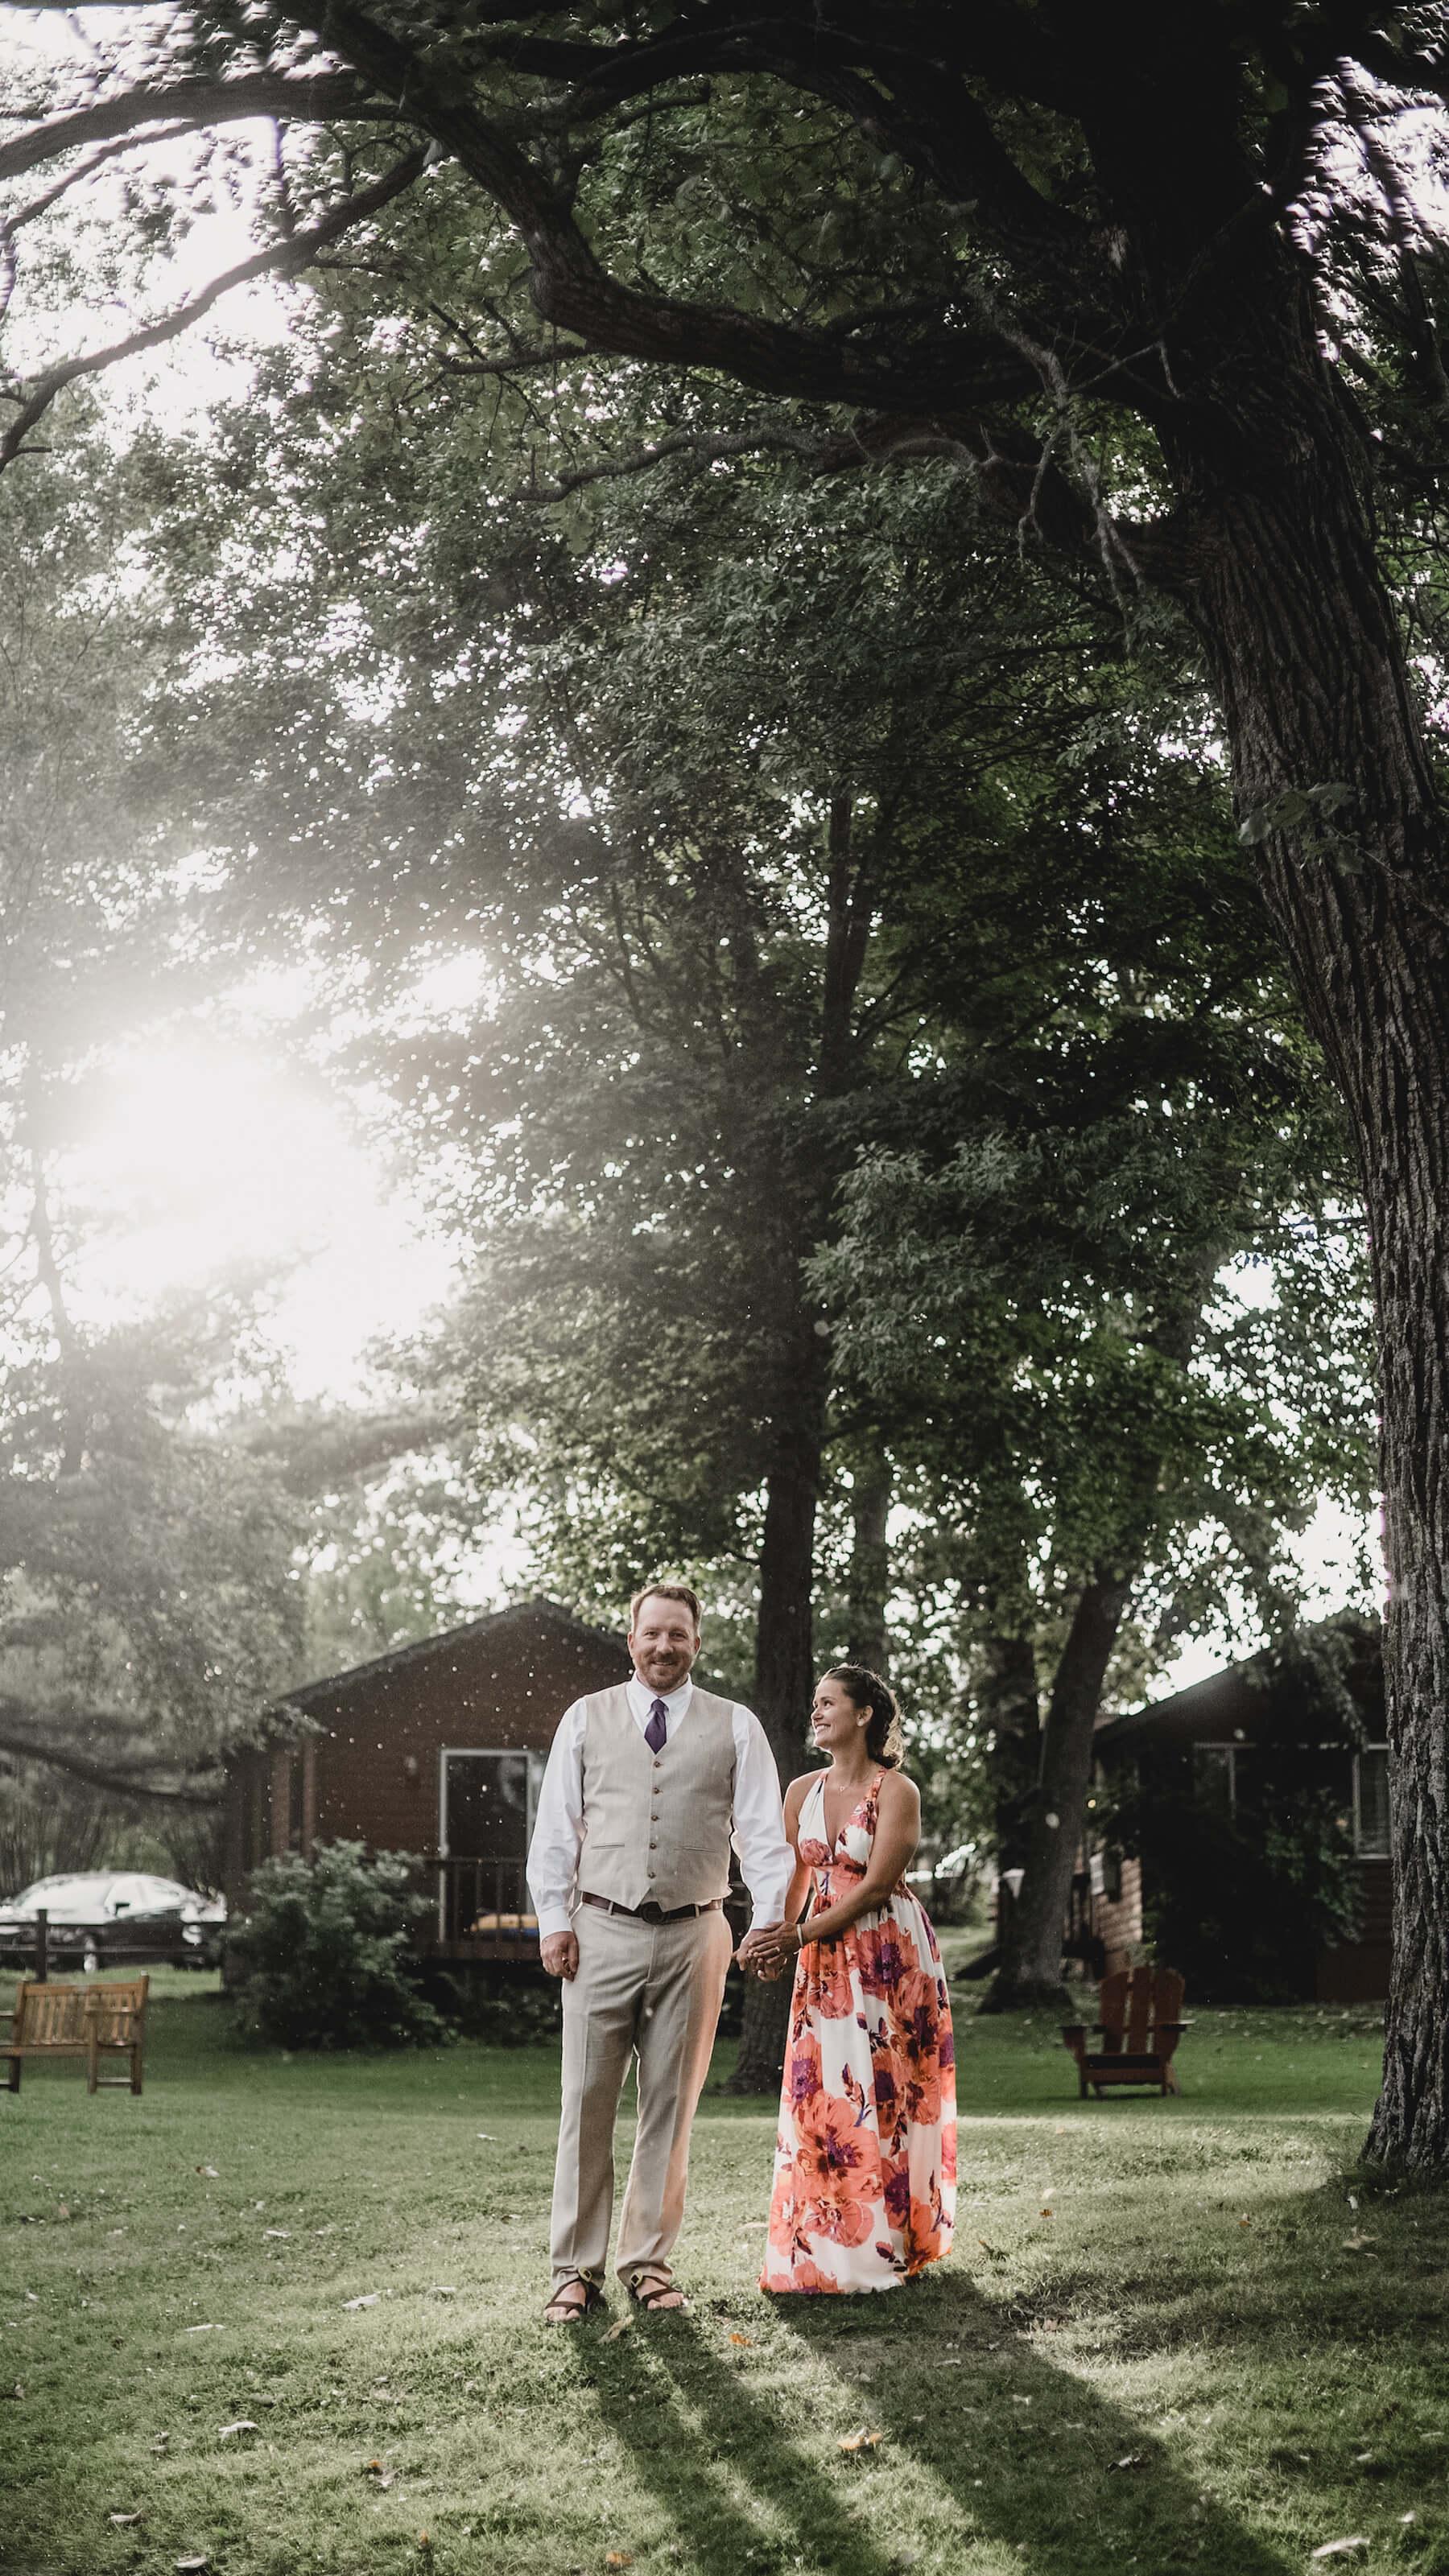 engle-olson-maddy-pat-mn-wedding-photography-39.jpg